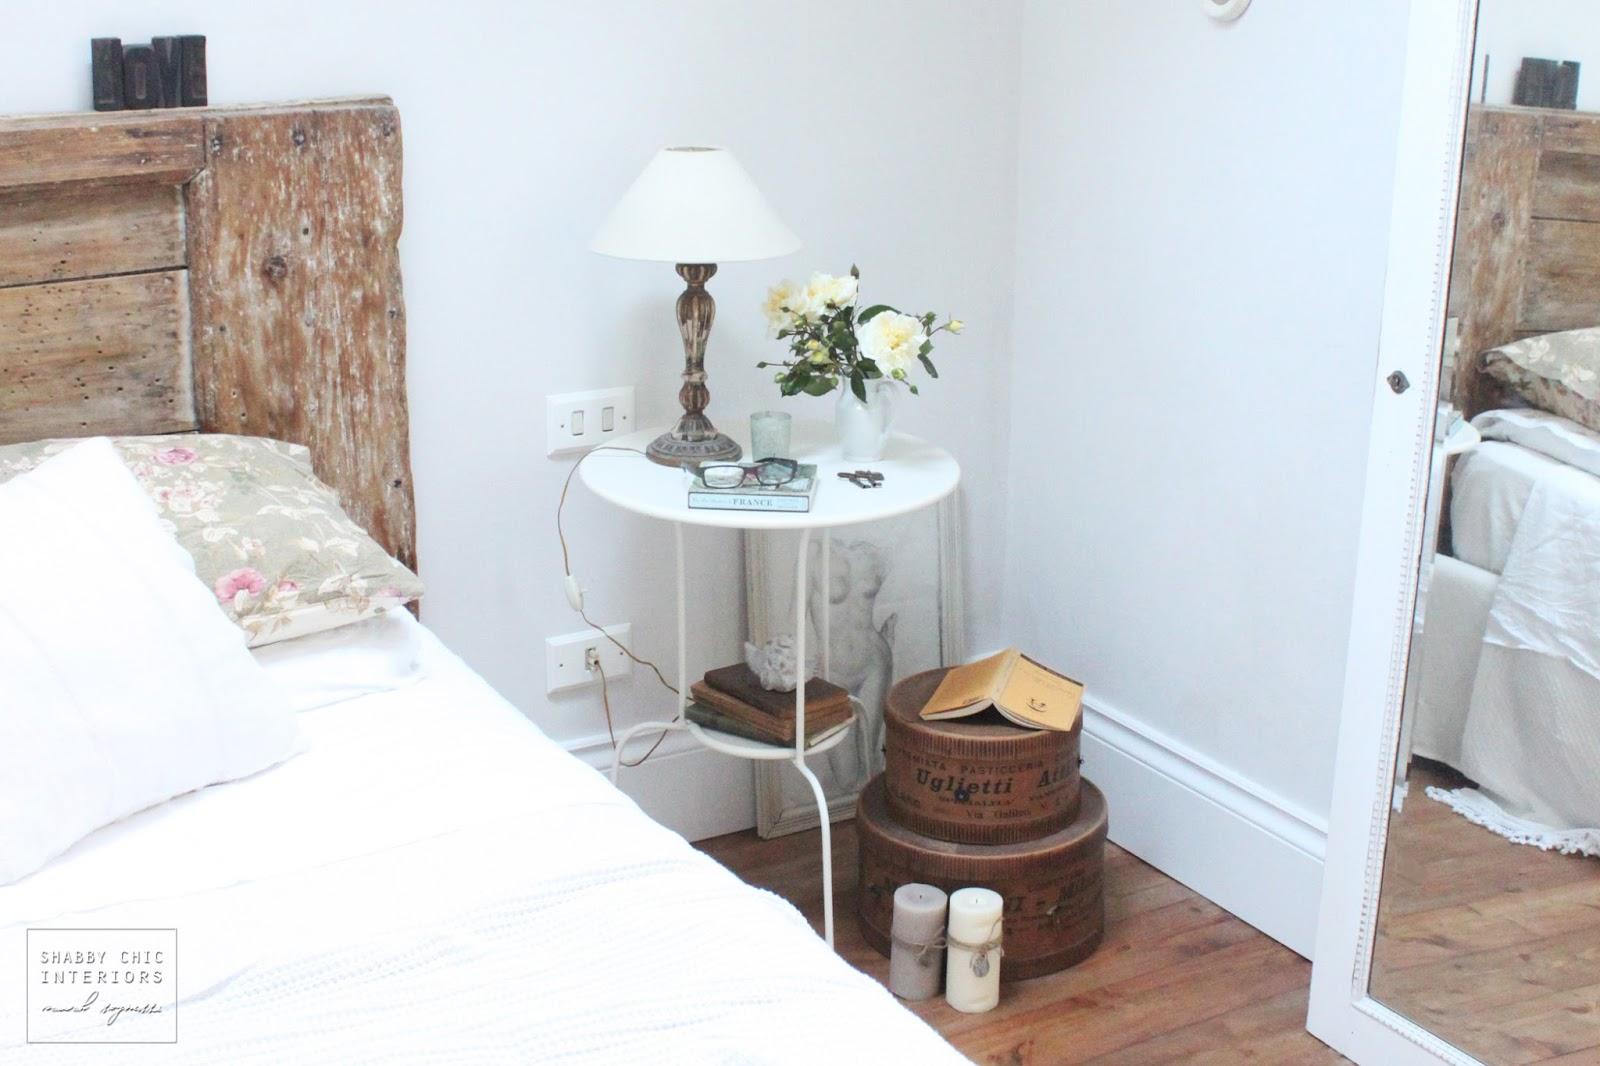 Letti Matrimoniali Shabby Chic : Camere shabby chic camera da letto camera da letto shabby chic